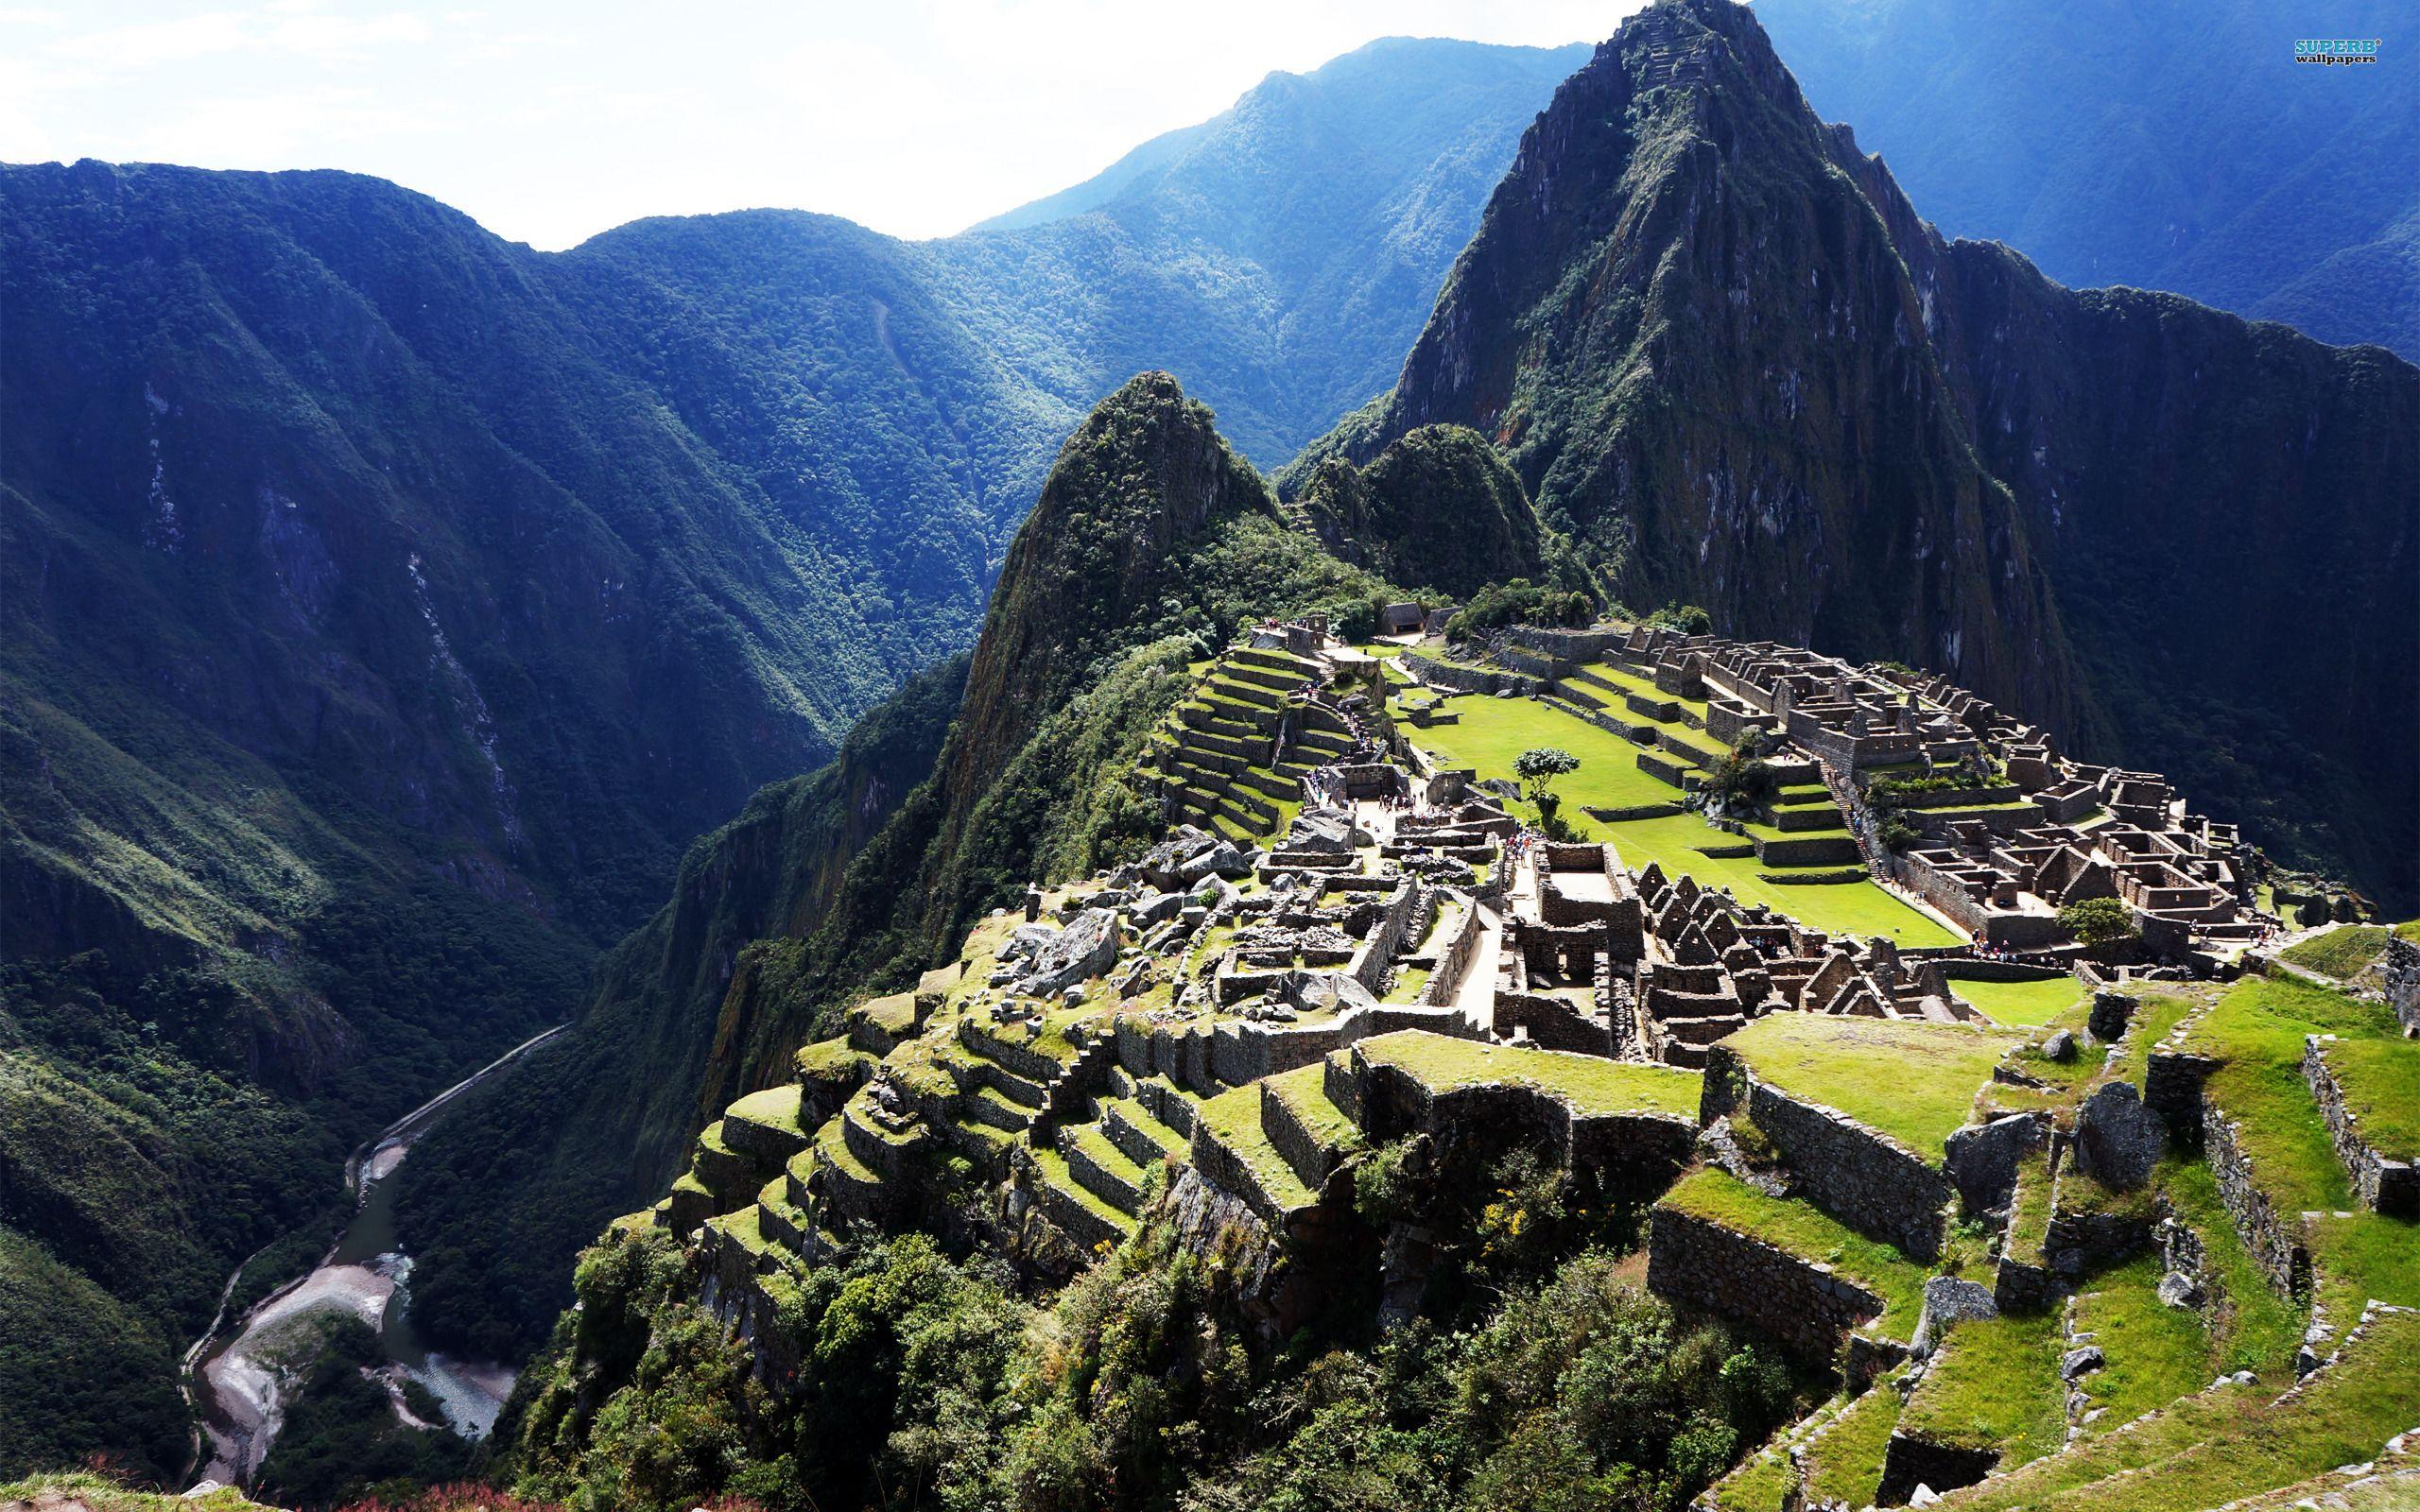 Fondos de pantalla paisajes del peru en 4k para el fondo for Fondos de pantalla 7 maravillas del mundo